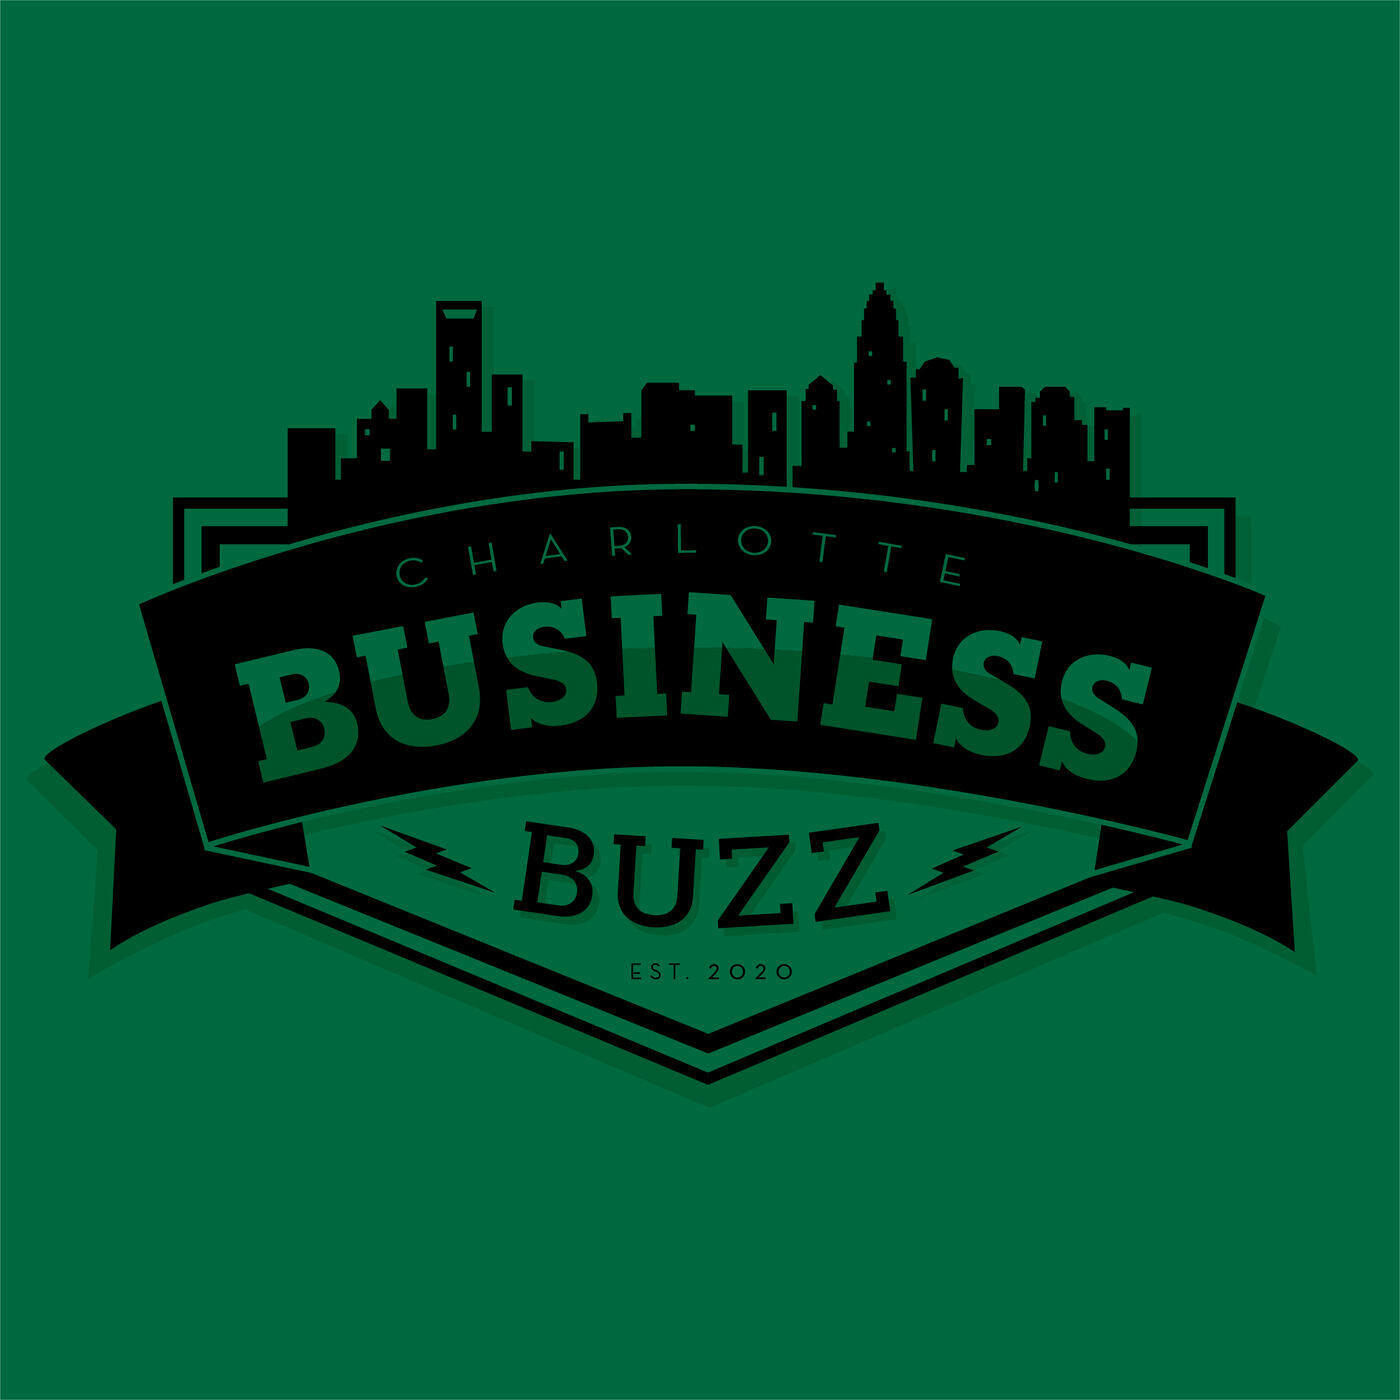 Charlotte Business Buzz